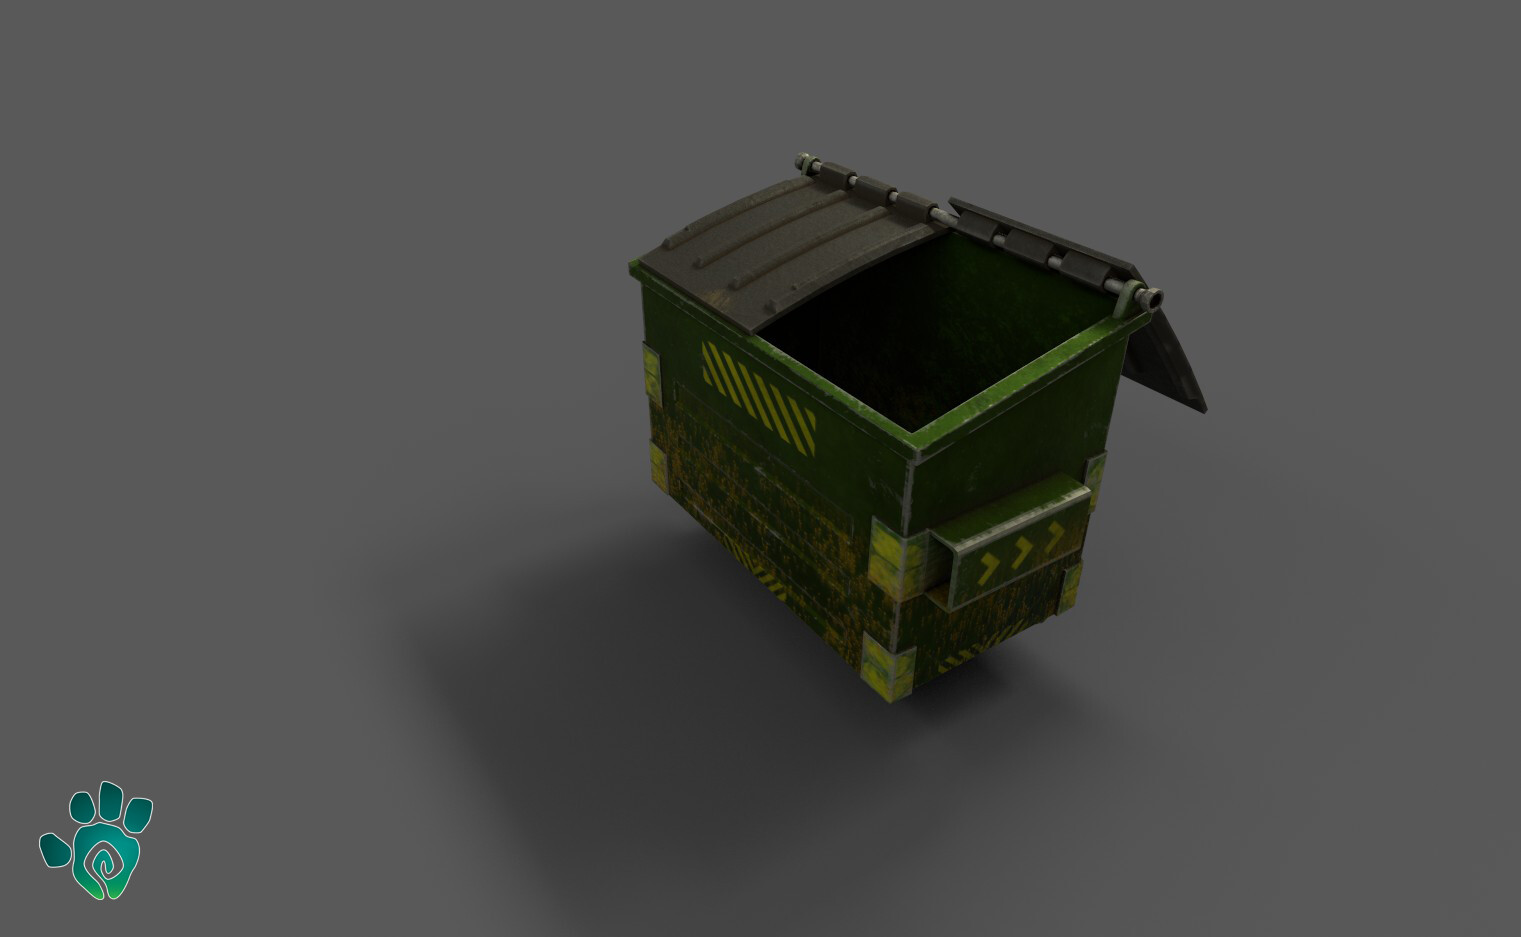 Zach cordisco dumpster 2